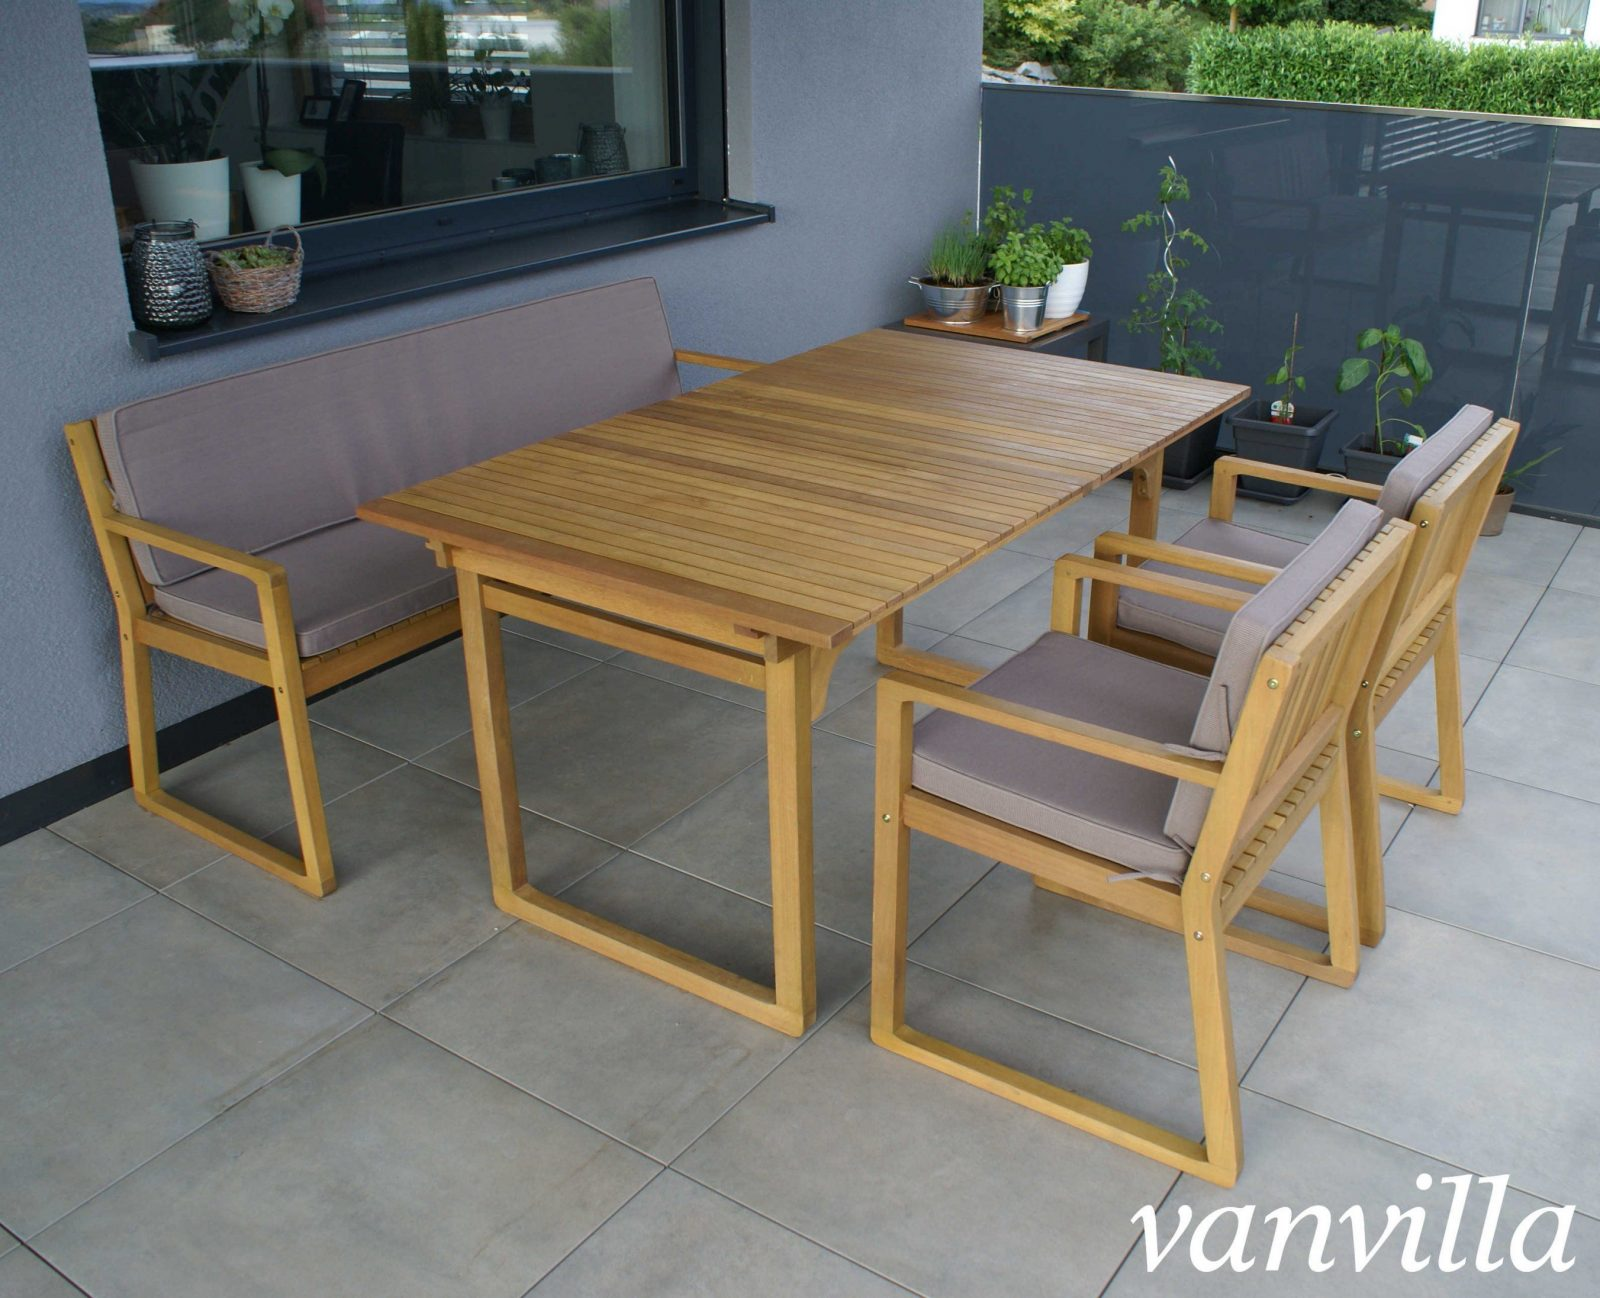 Vanvilla Gartenmöbel Set Holz 1 Tisch 1 Bank 2 Sessel Set6 Auflage Braun von Gartenmöbel Set Holz Mit Bank Bild